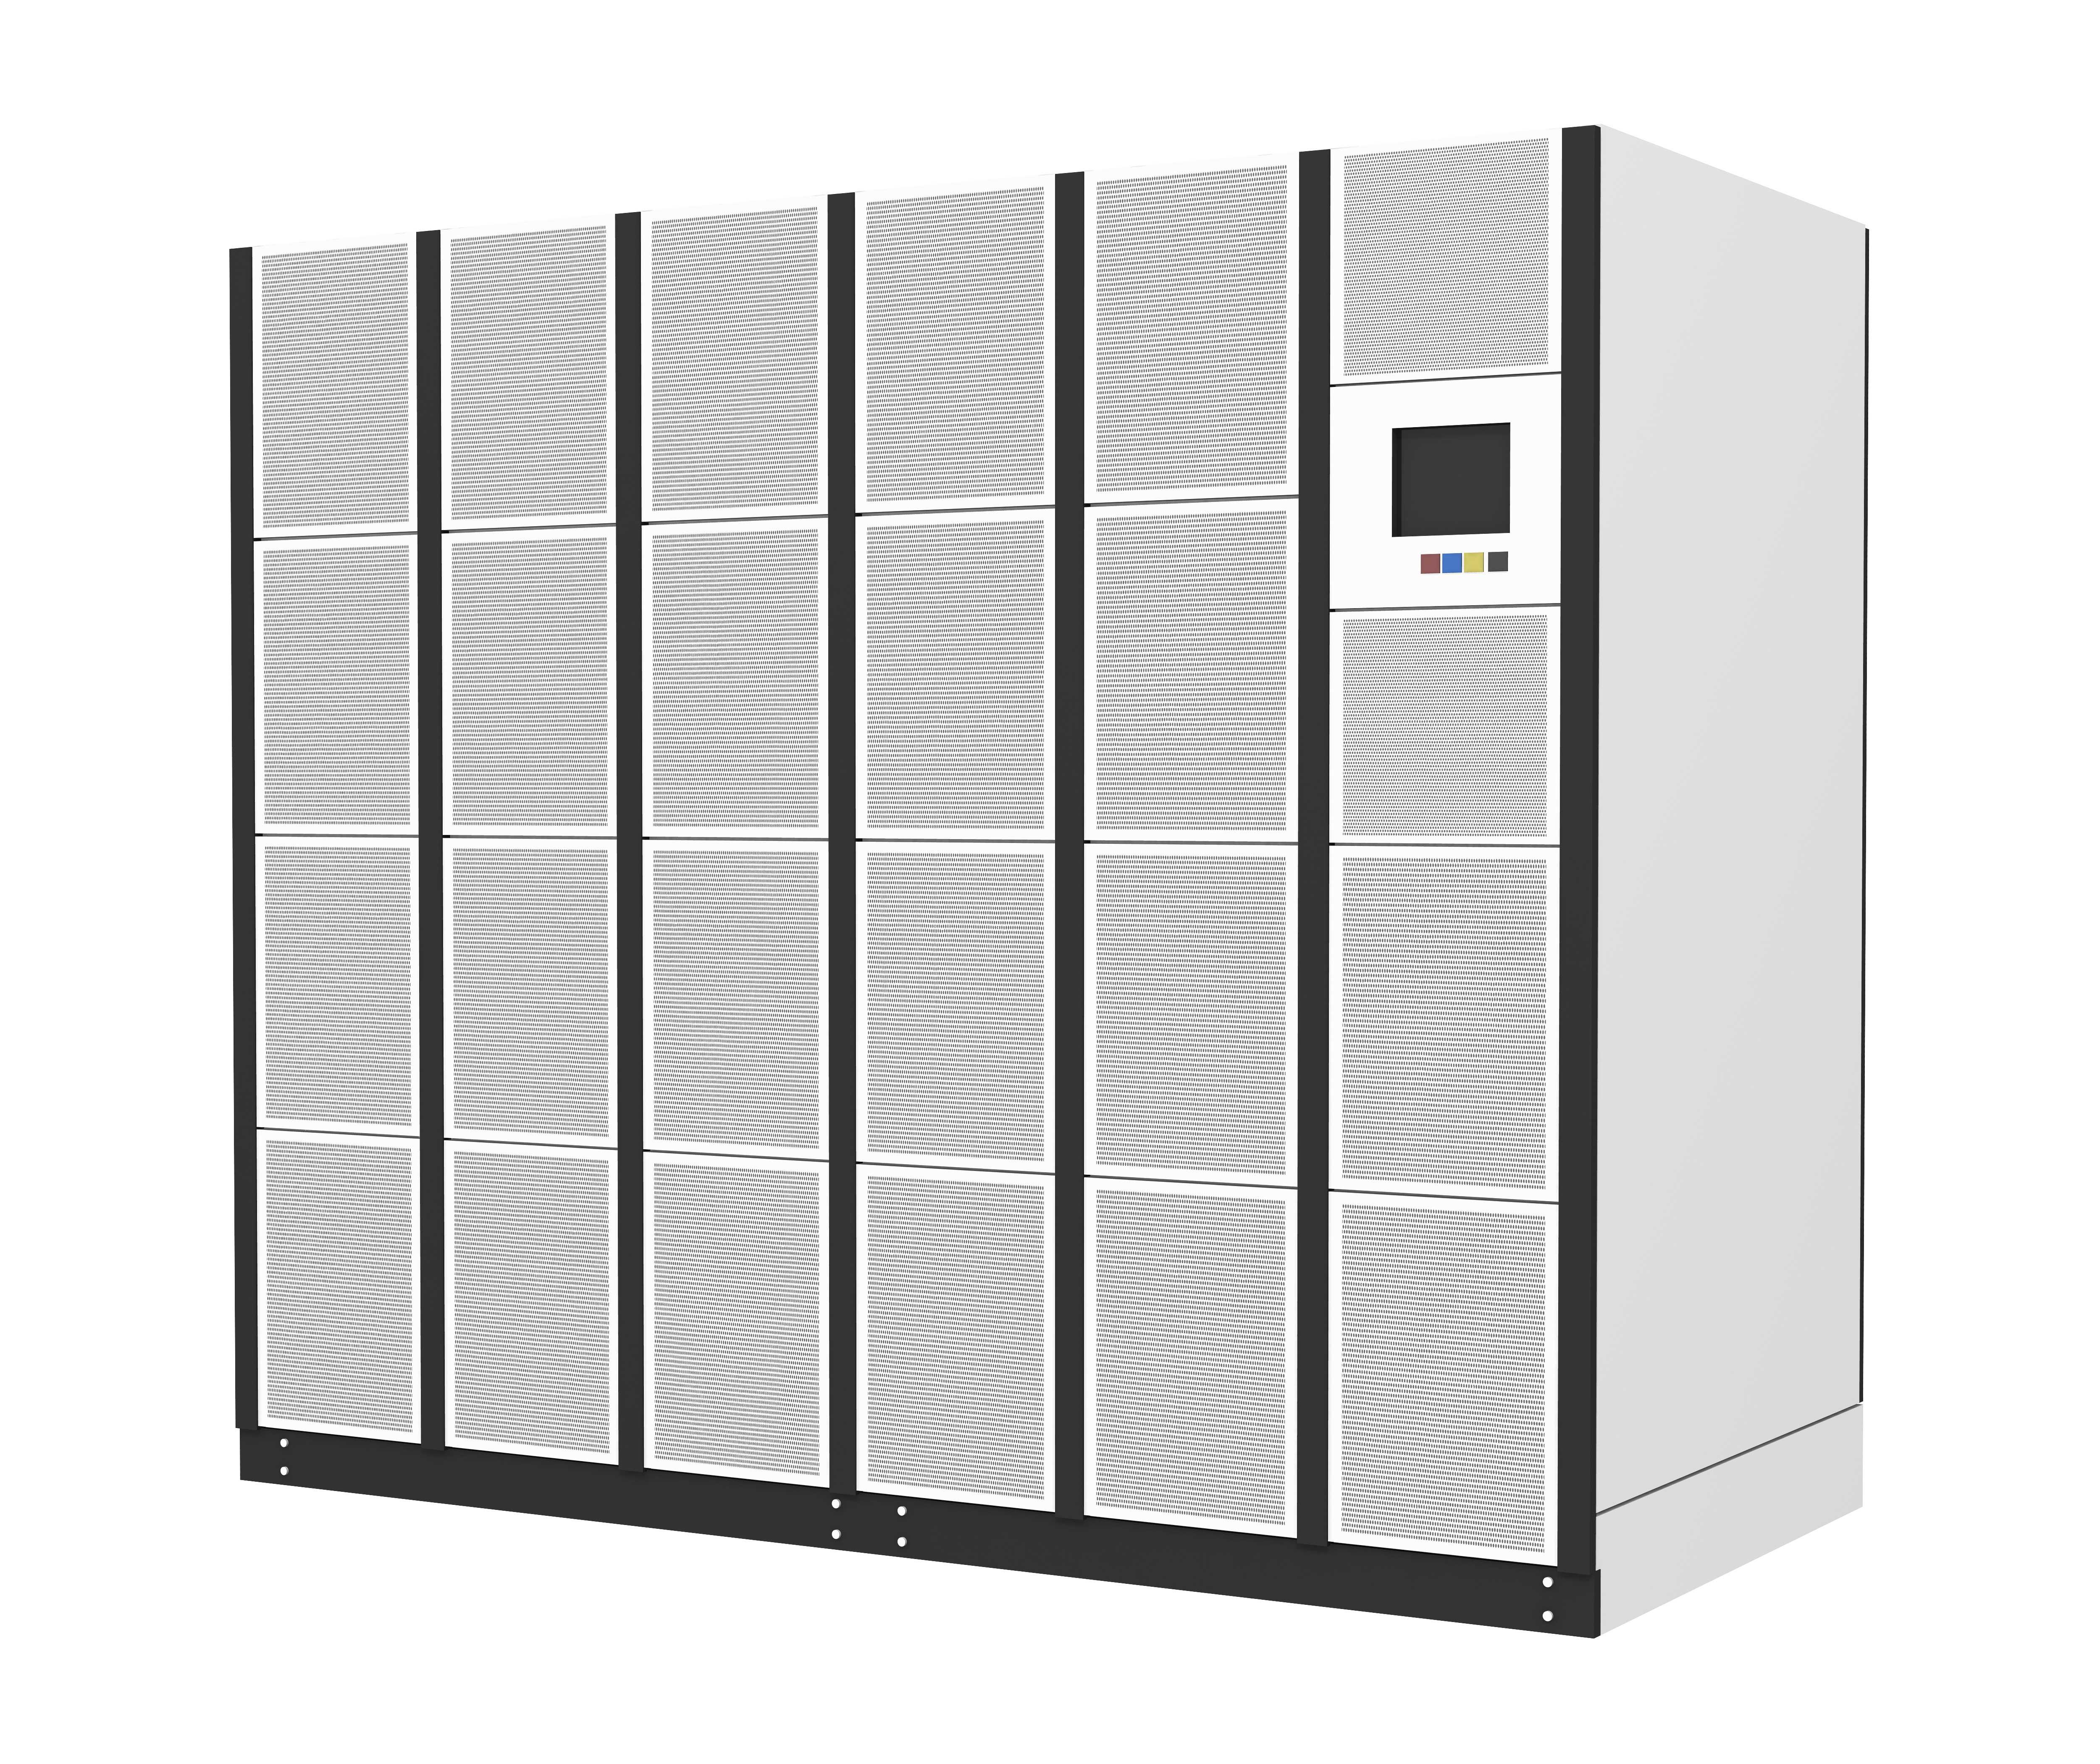 Large Uninterruptible Power Supply (UPS) System